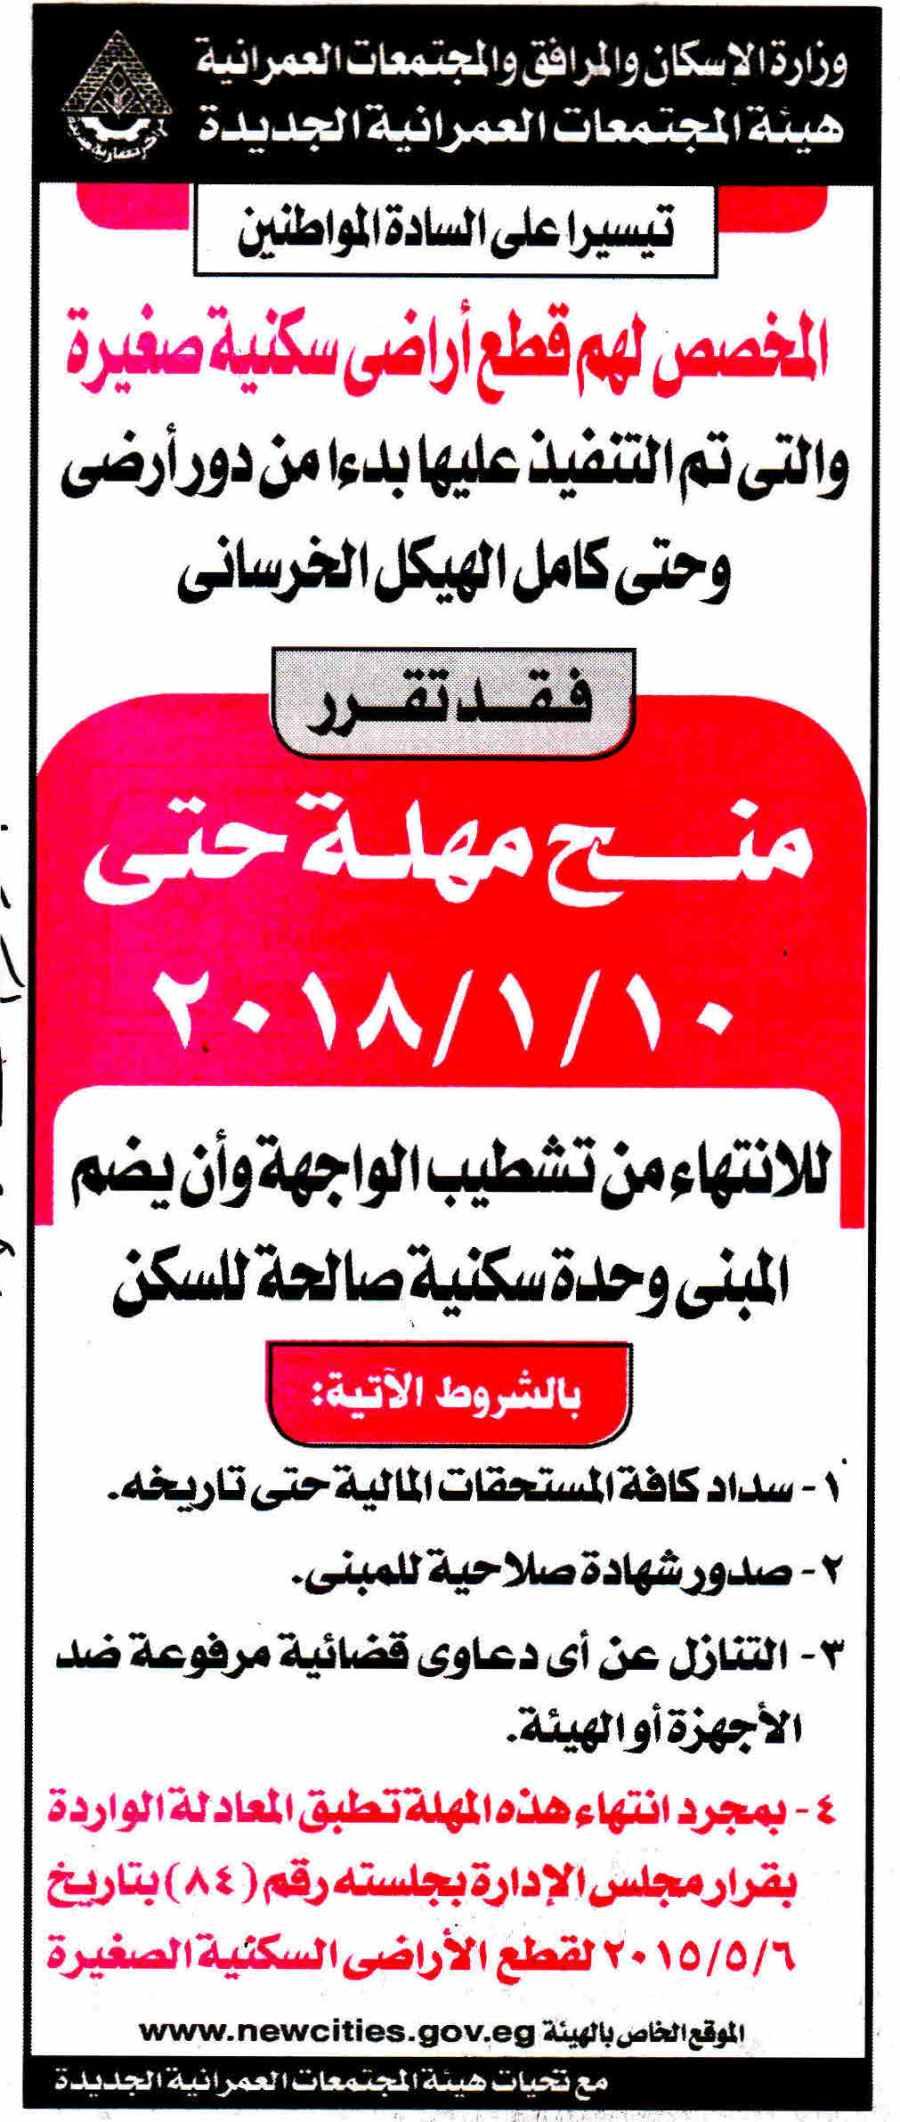 Al Ahram 30 Aug P.1.jpg